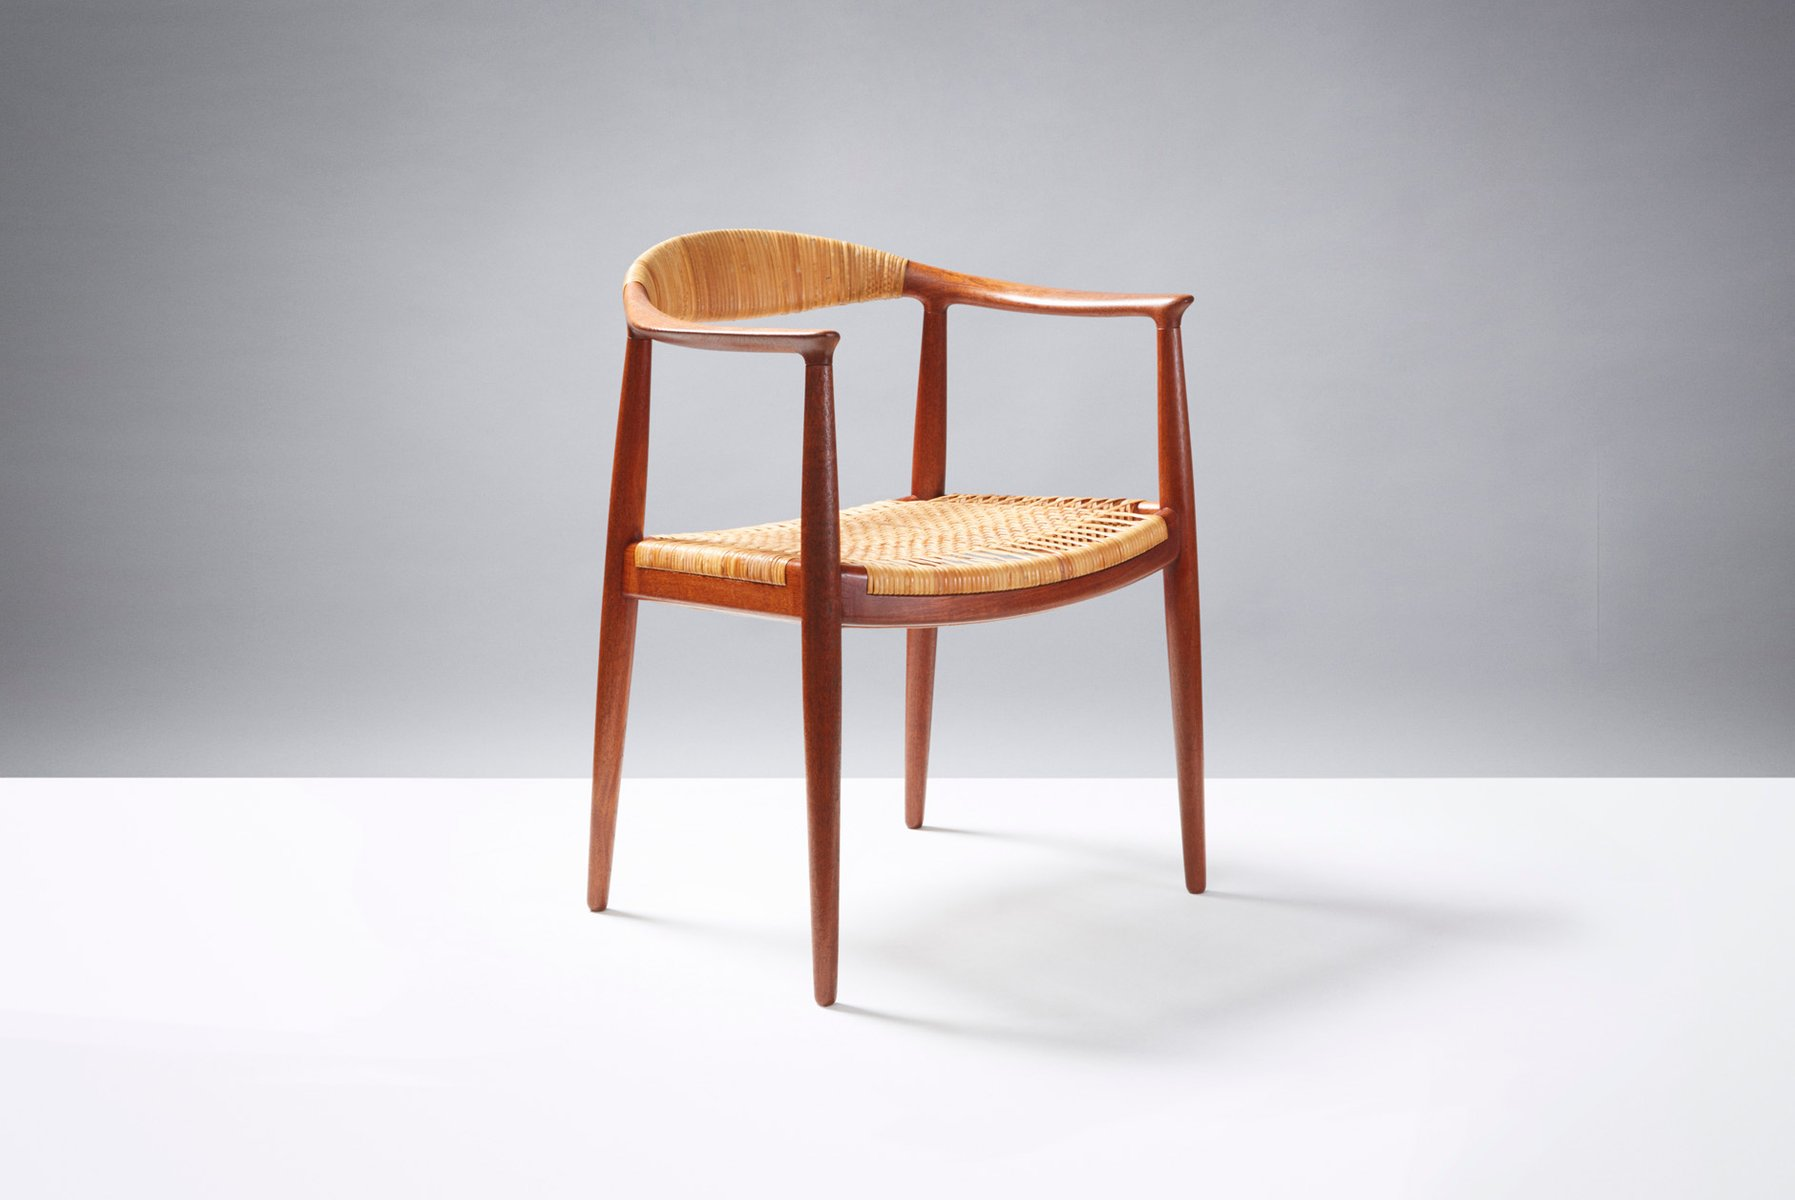 model jh 501 the chair desk chair by hans j wegner for. Black Bedroom Furniture Sets. Home Design Ideas